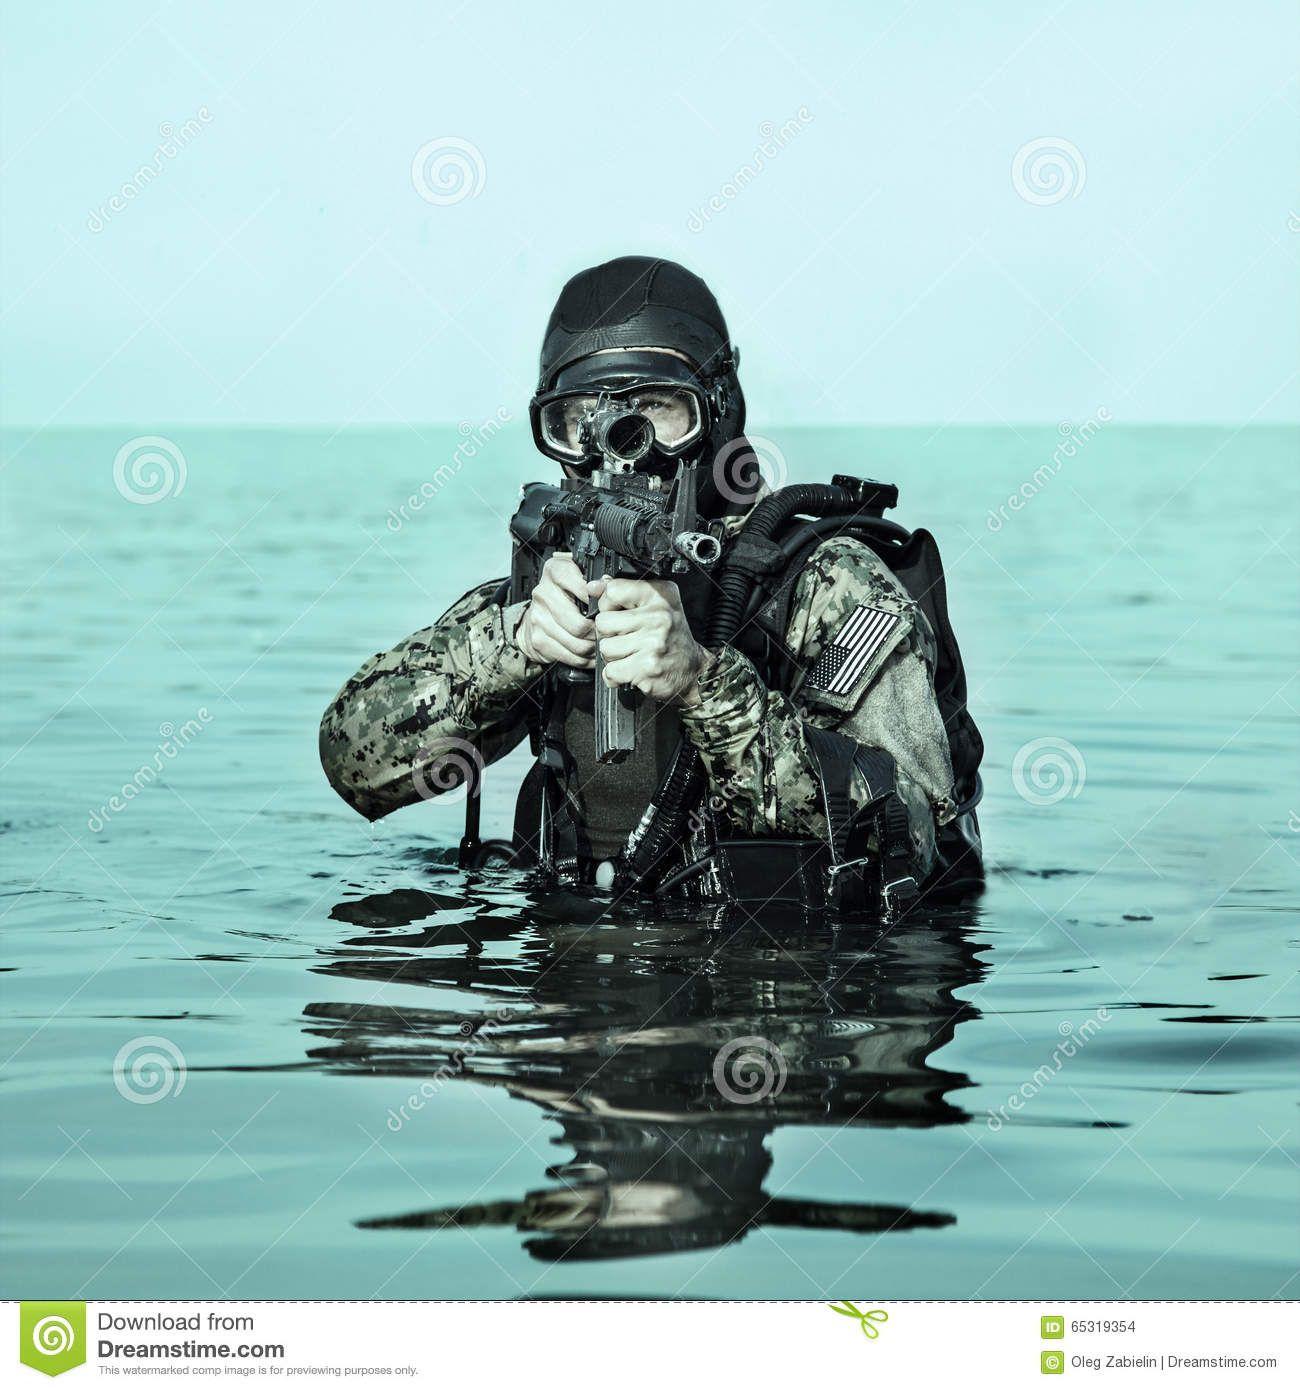 Current & Future Eyewear for Navy Seals - SafetyGlassesUSA ...  |Navy Seals Emerging From Water